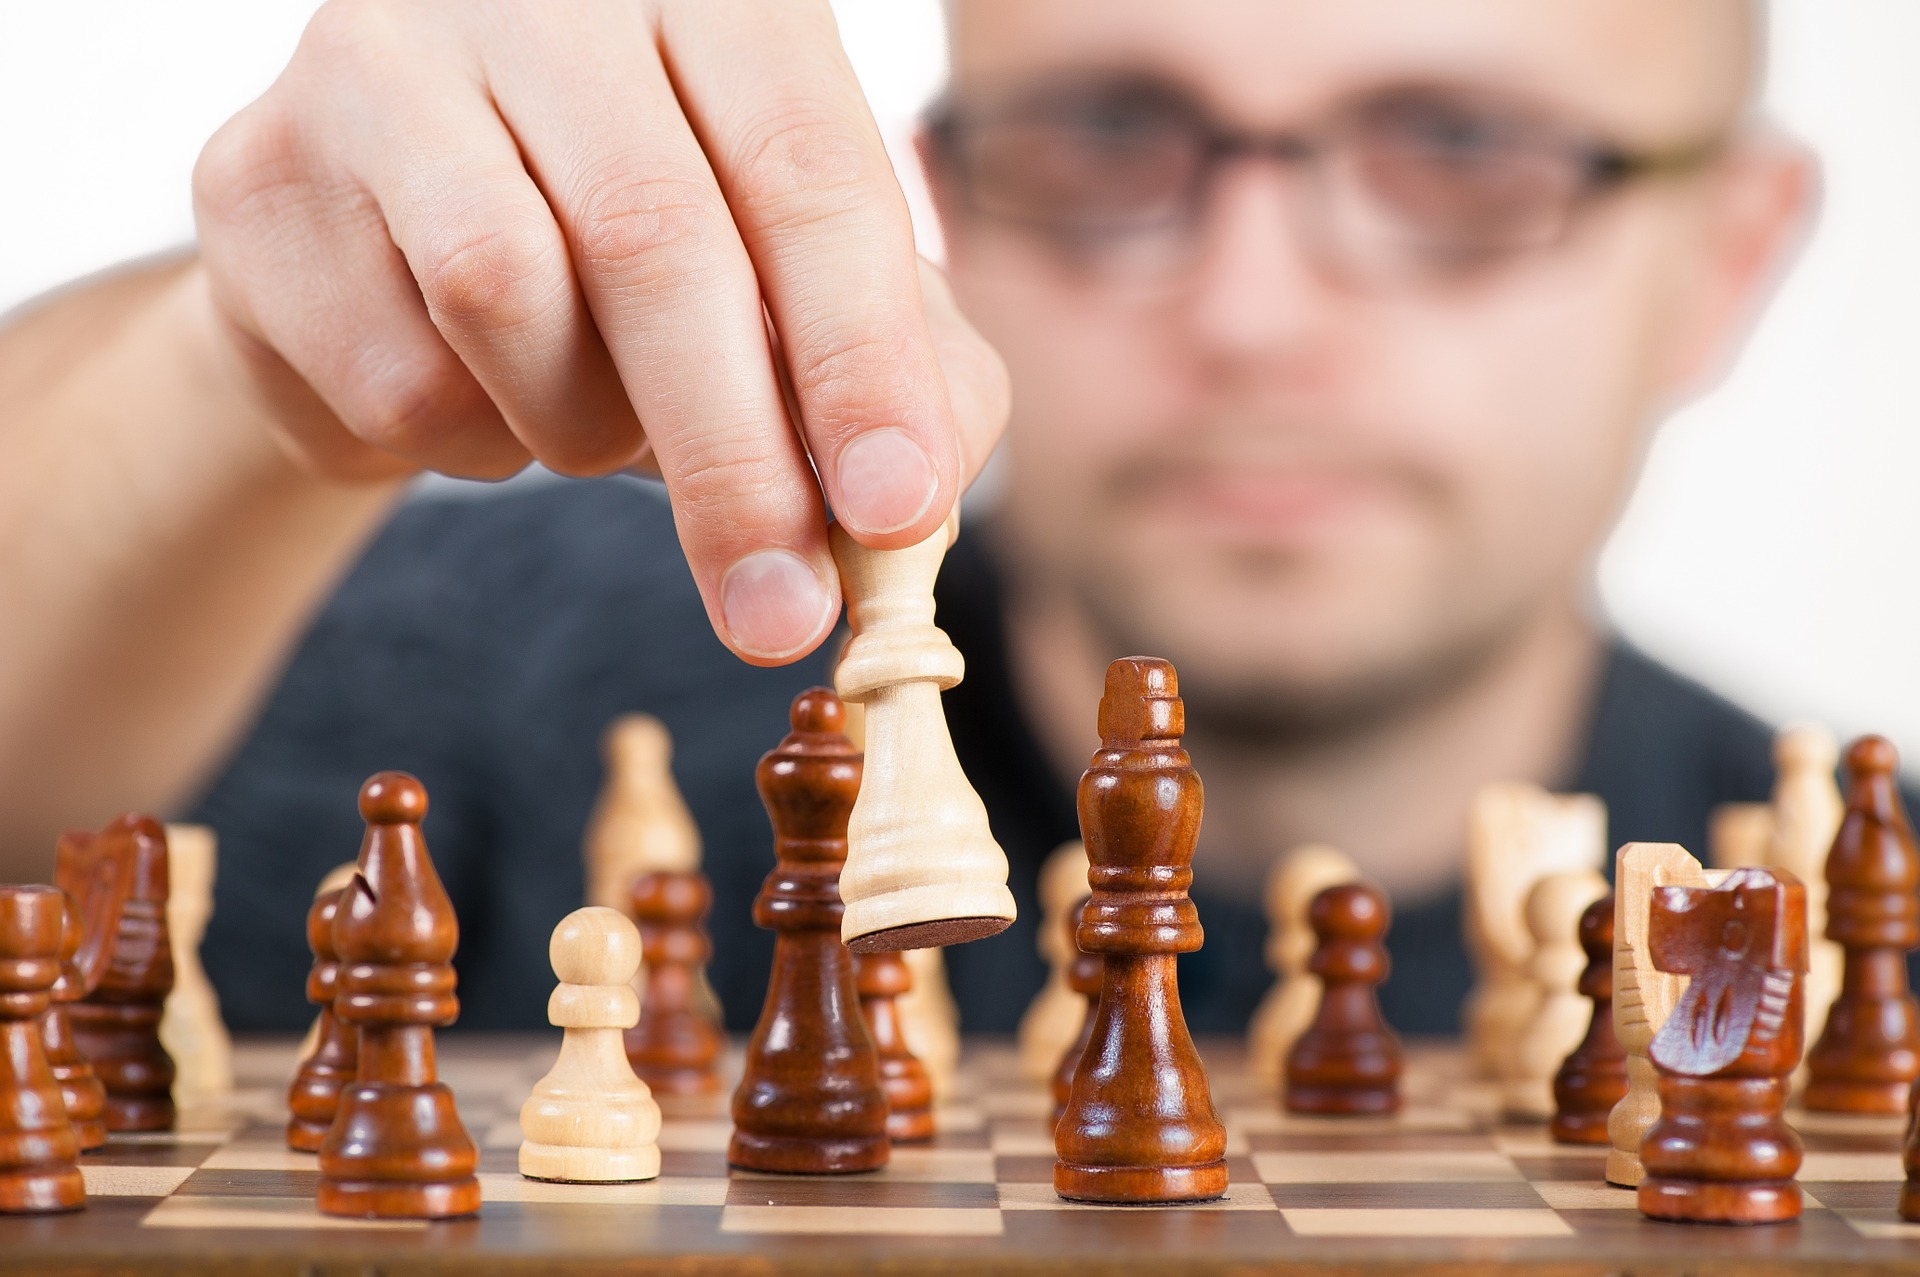 make smart manufacturing management decisions